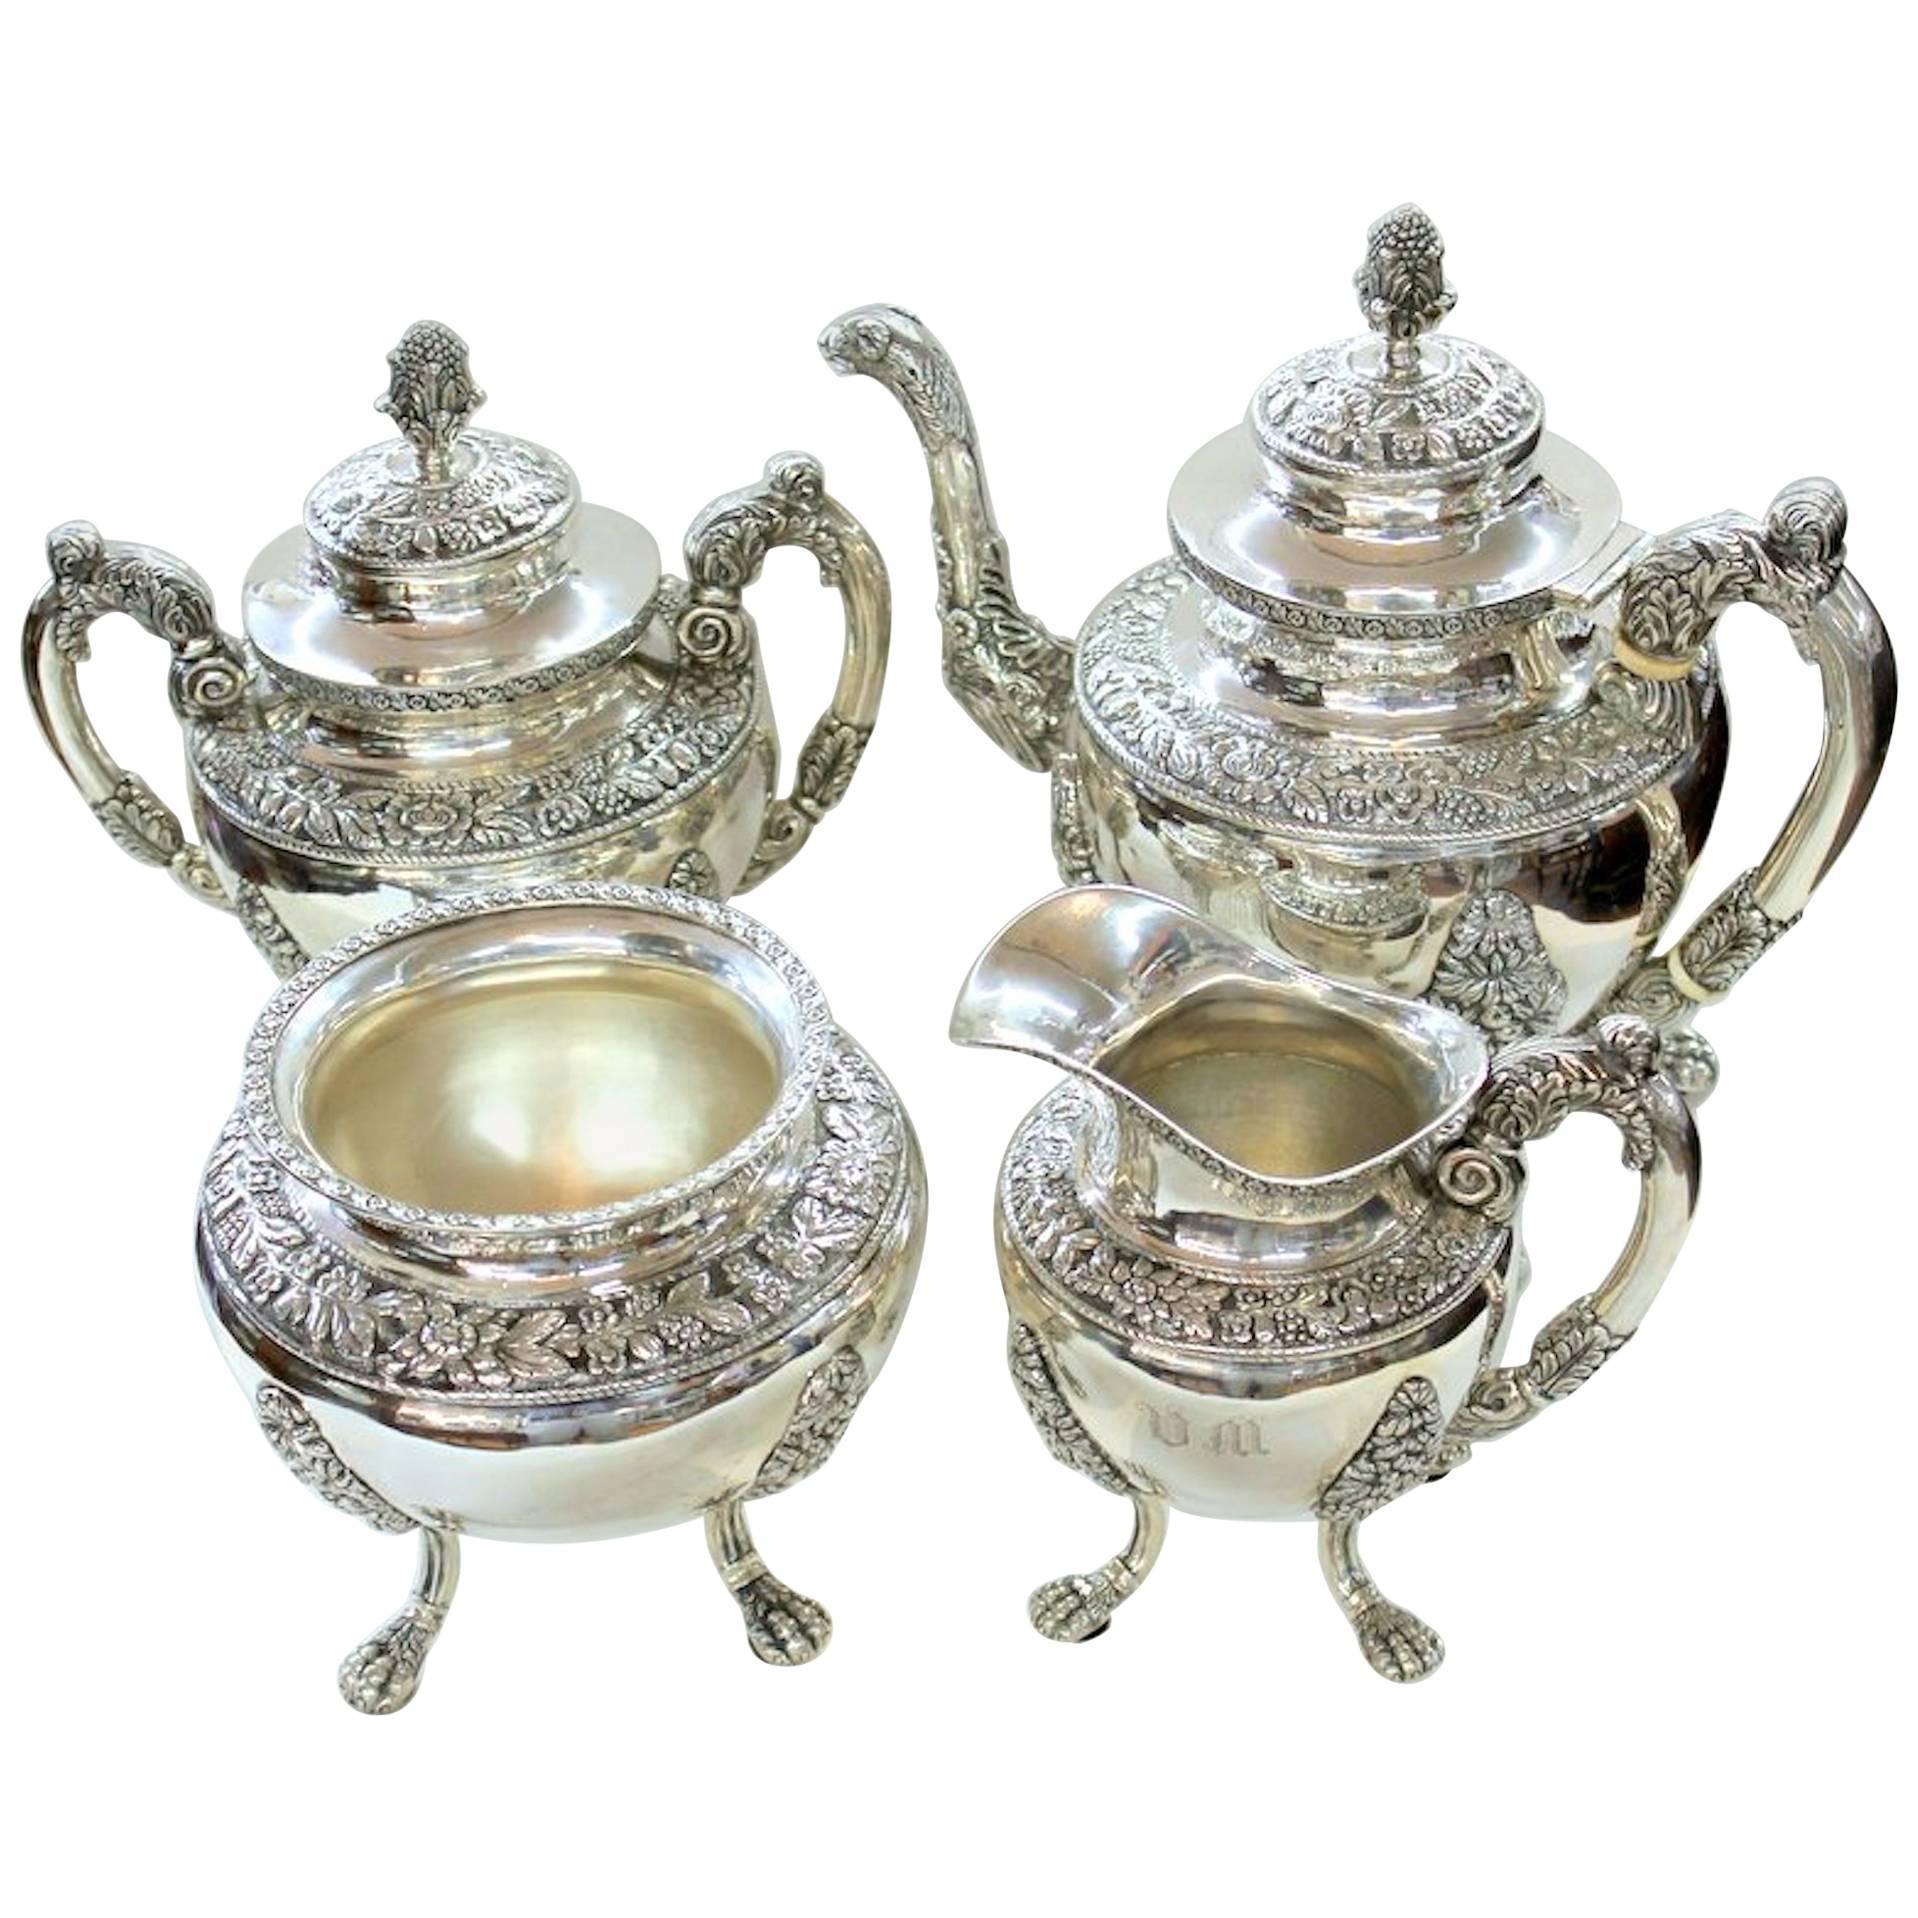 Antique American Coin Silver Rococo Style Four-Piece Tea Set by Andrew De Milt